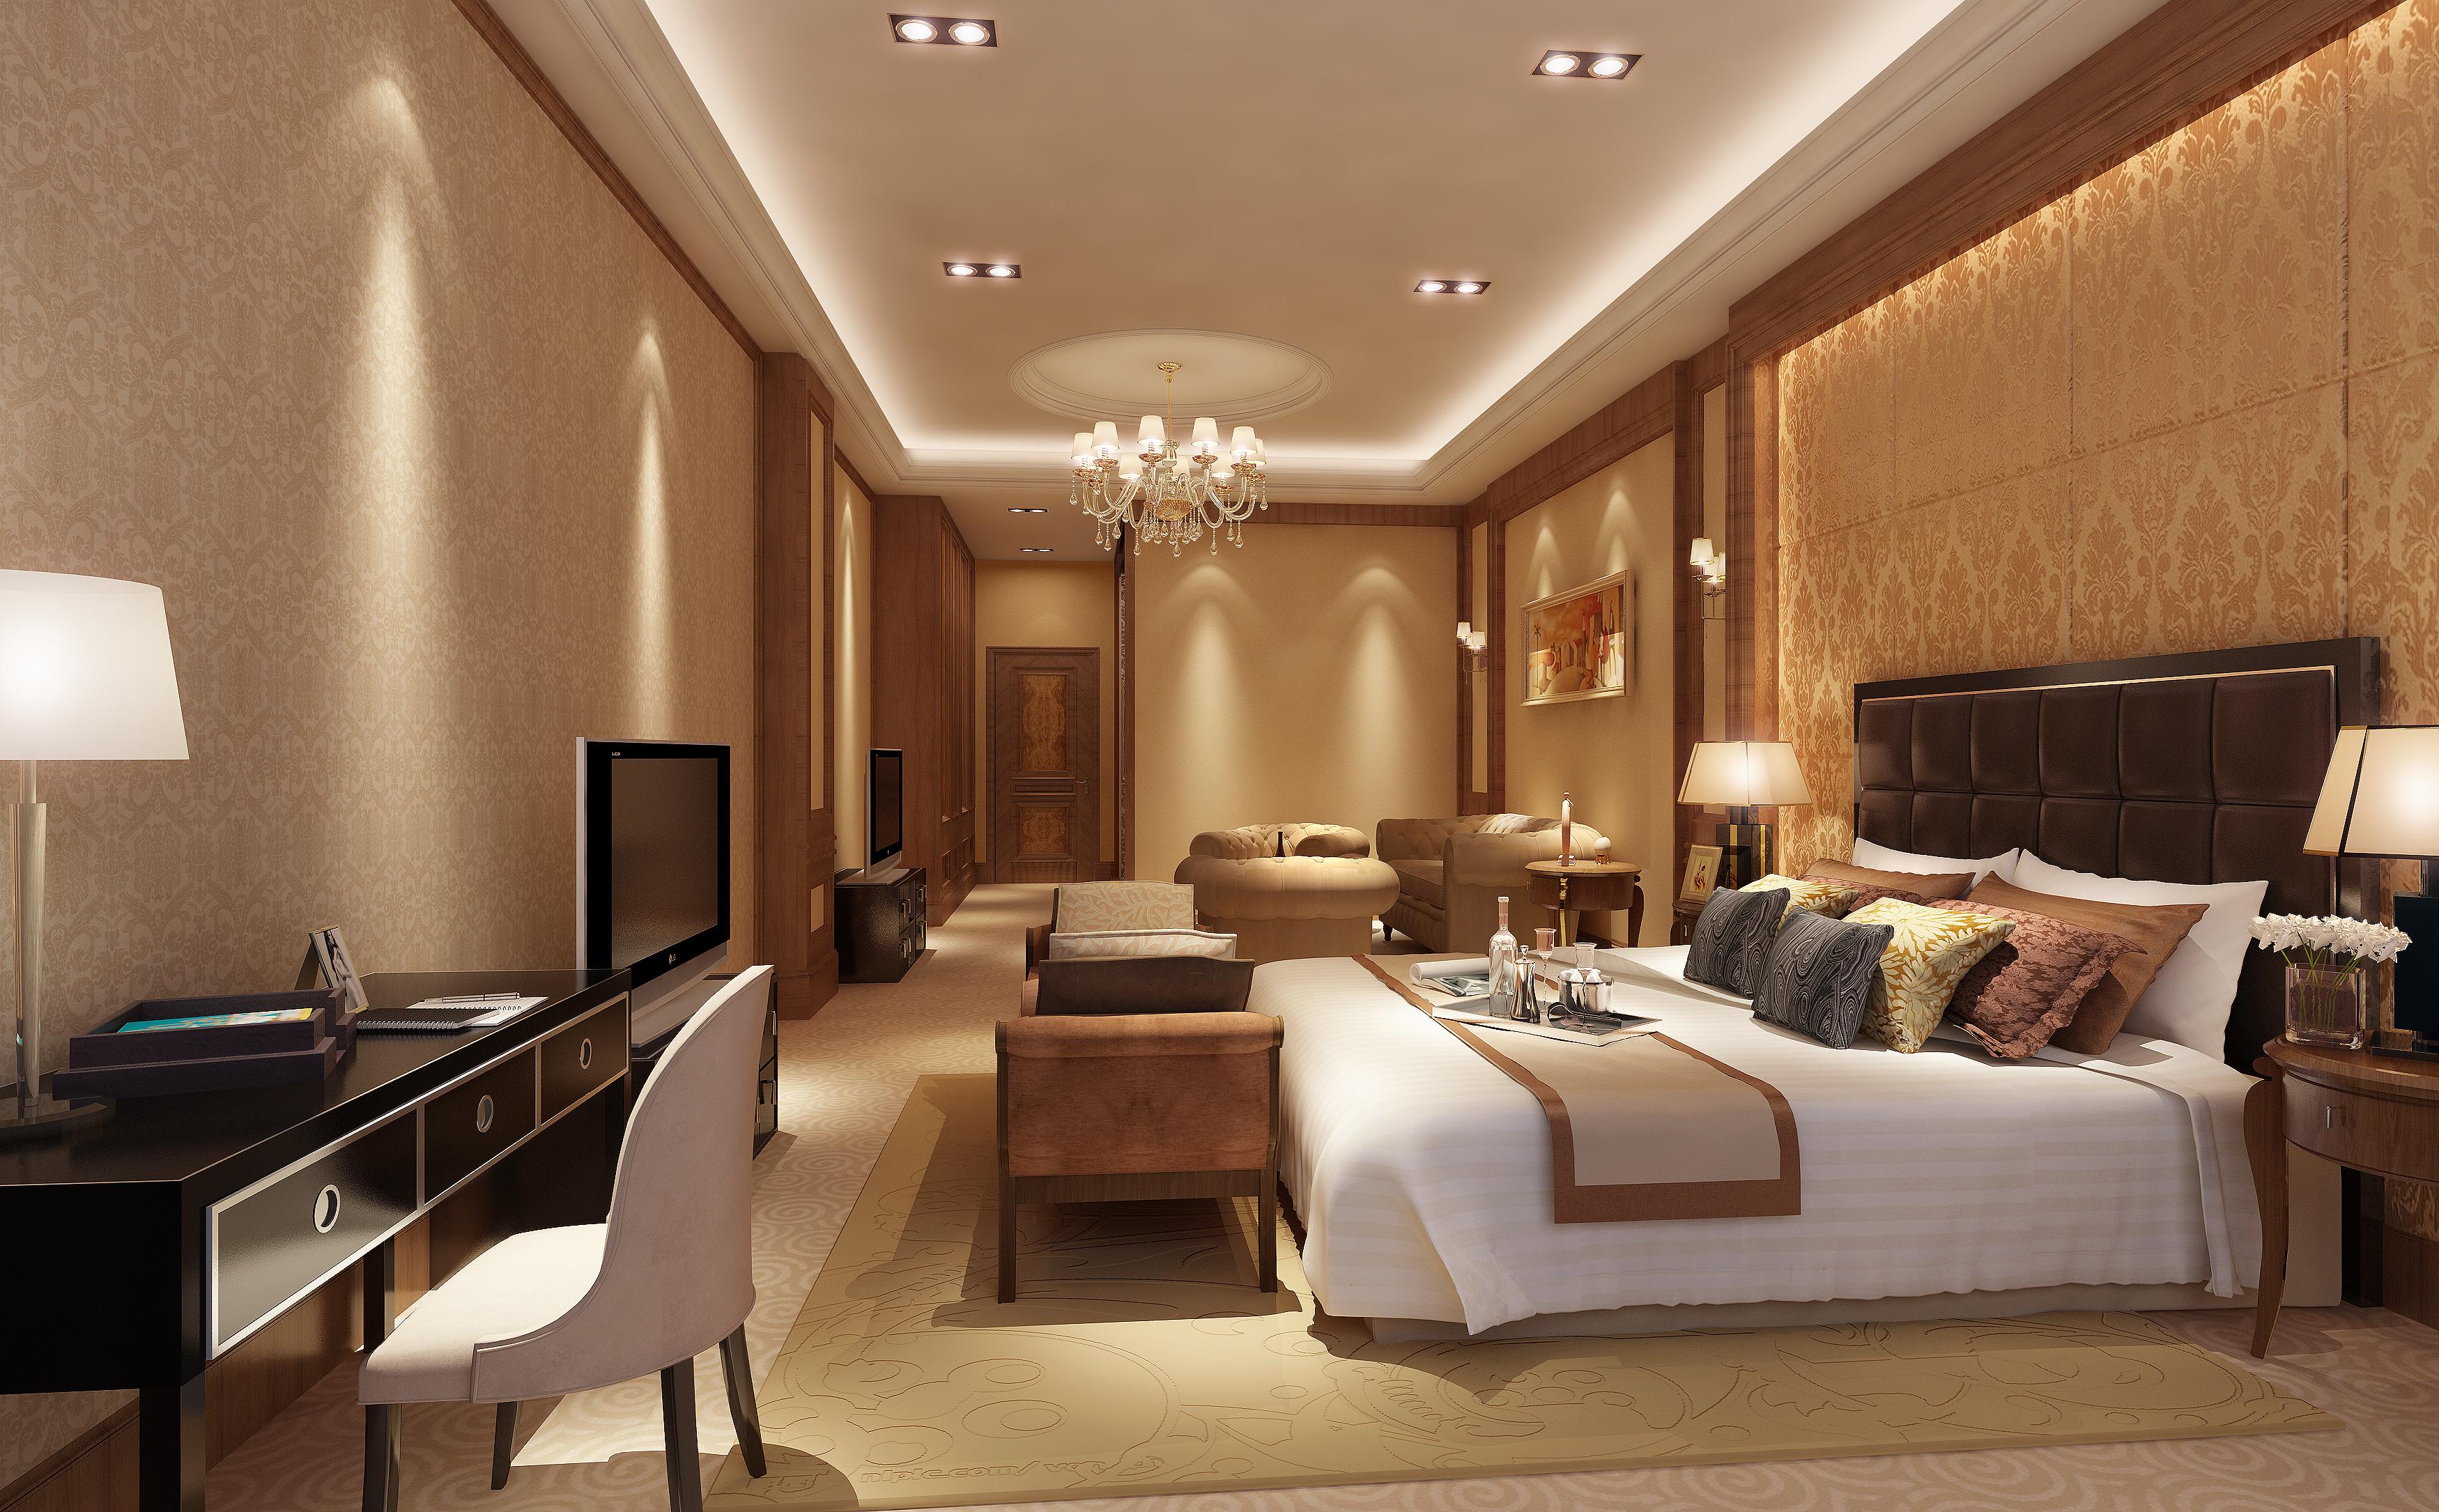 Chinese Bedroom Set Huge Bedroom 3d Model Max Cgtrader Com